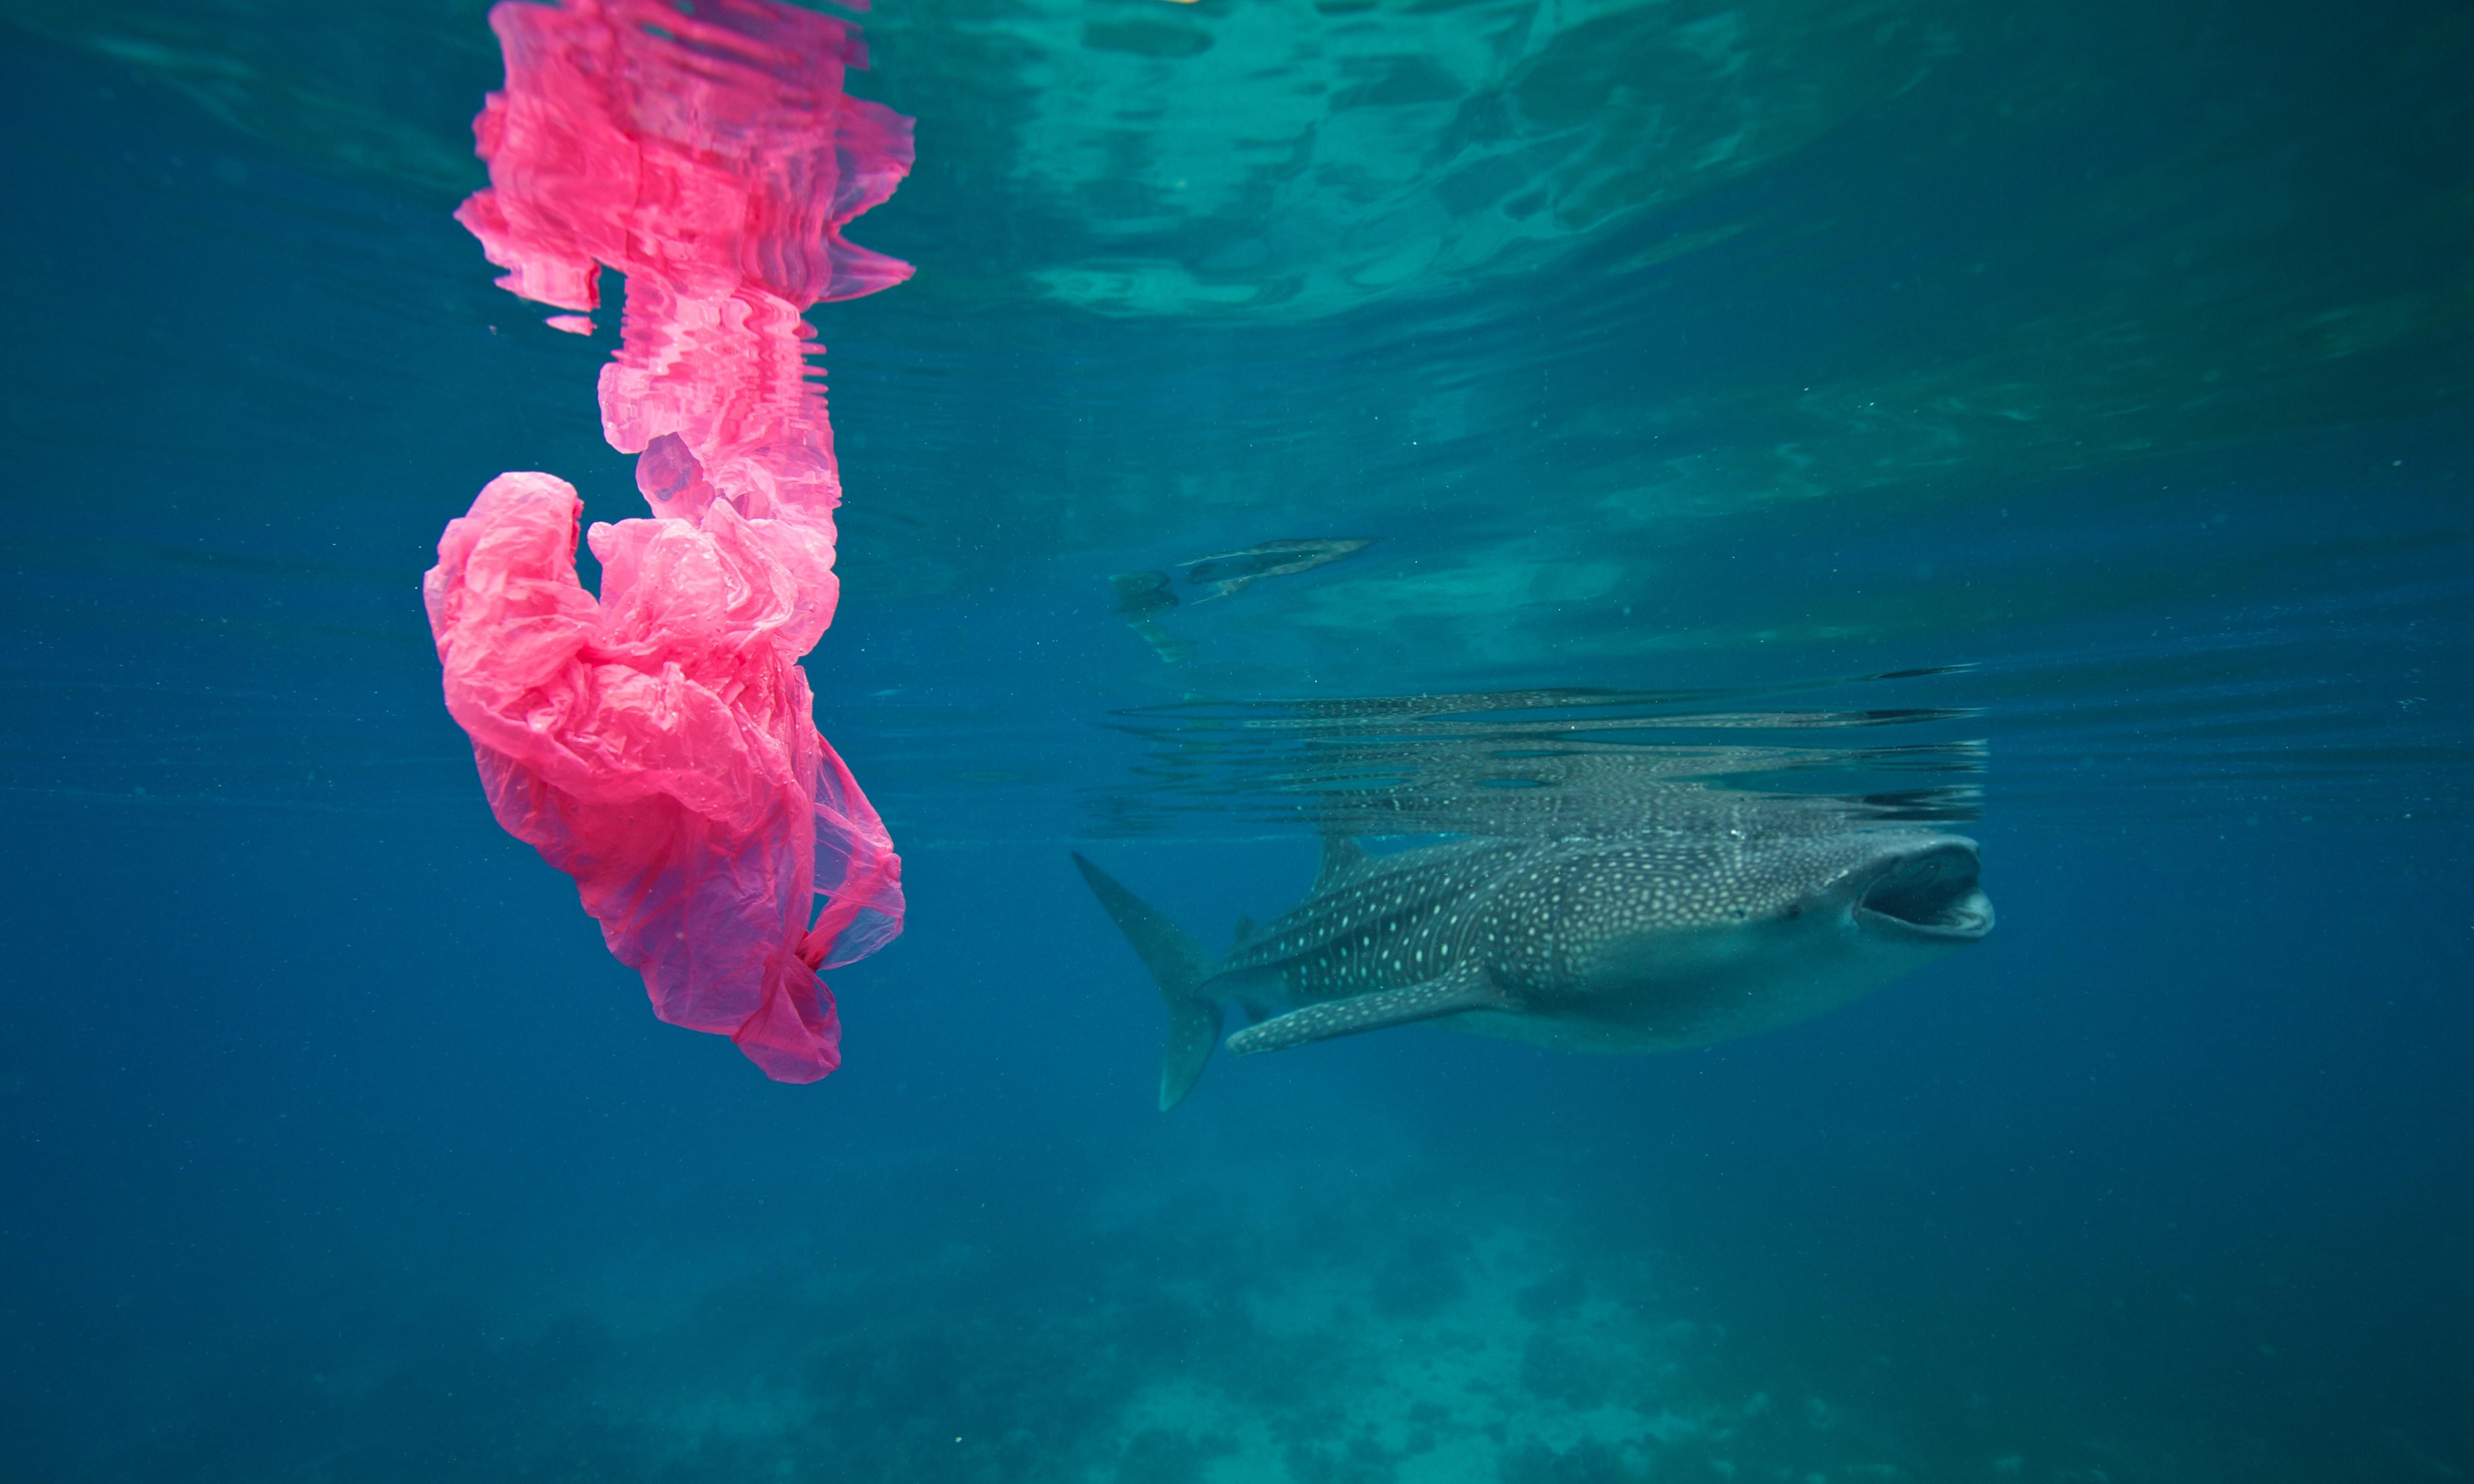 Single-use plastics a serious climate change hazard, study warns